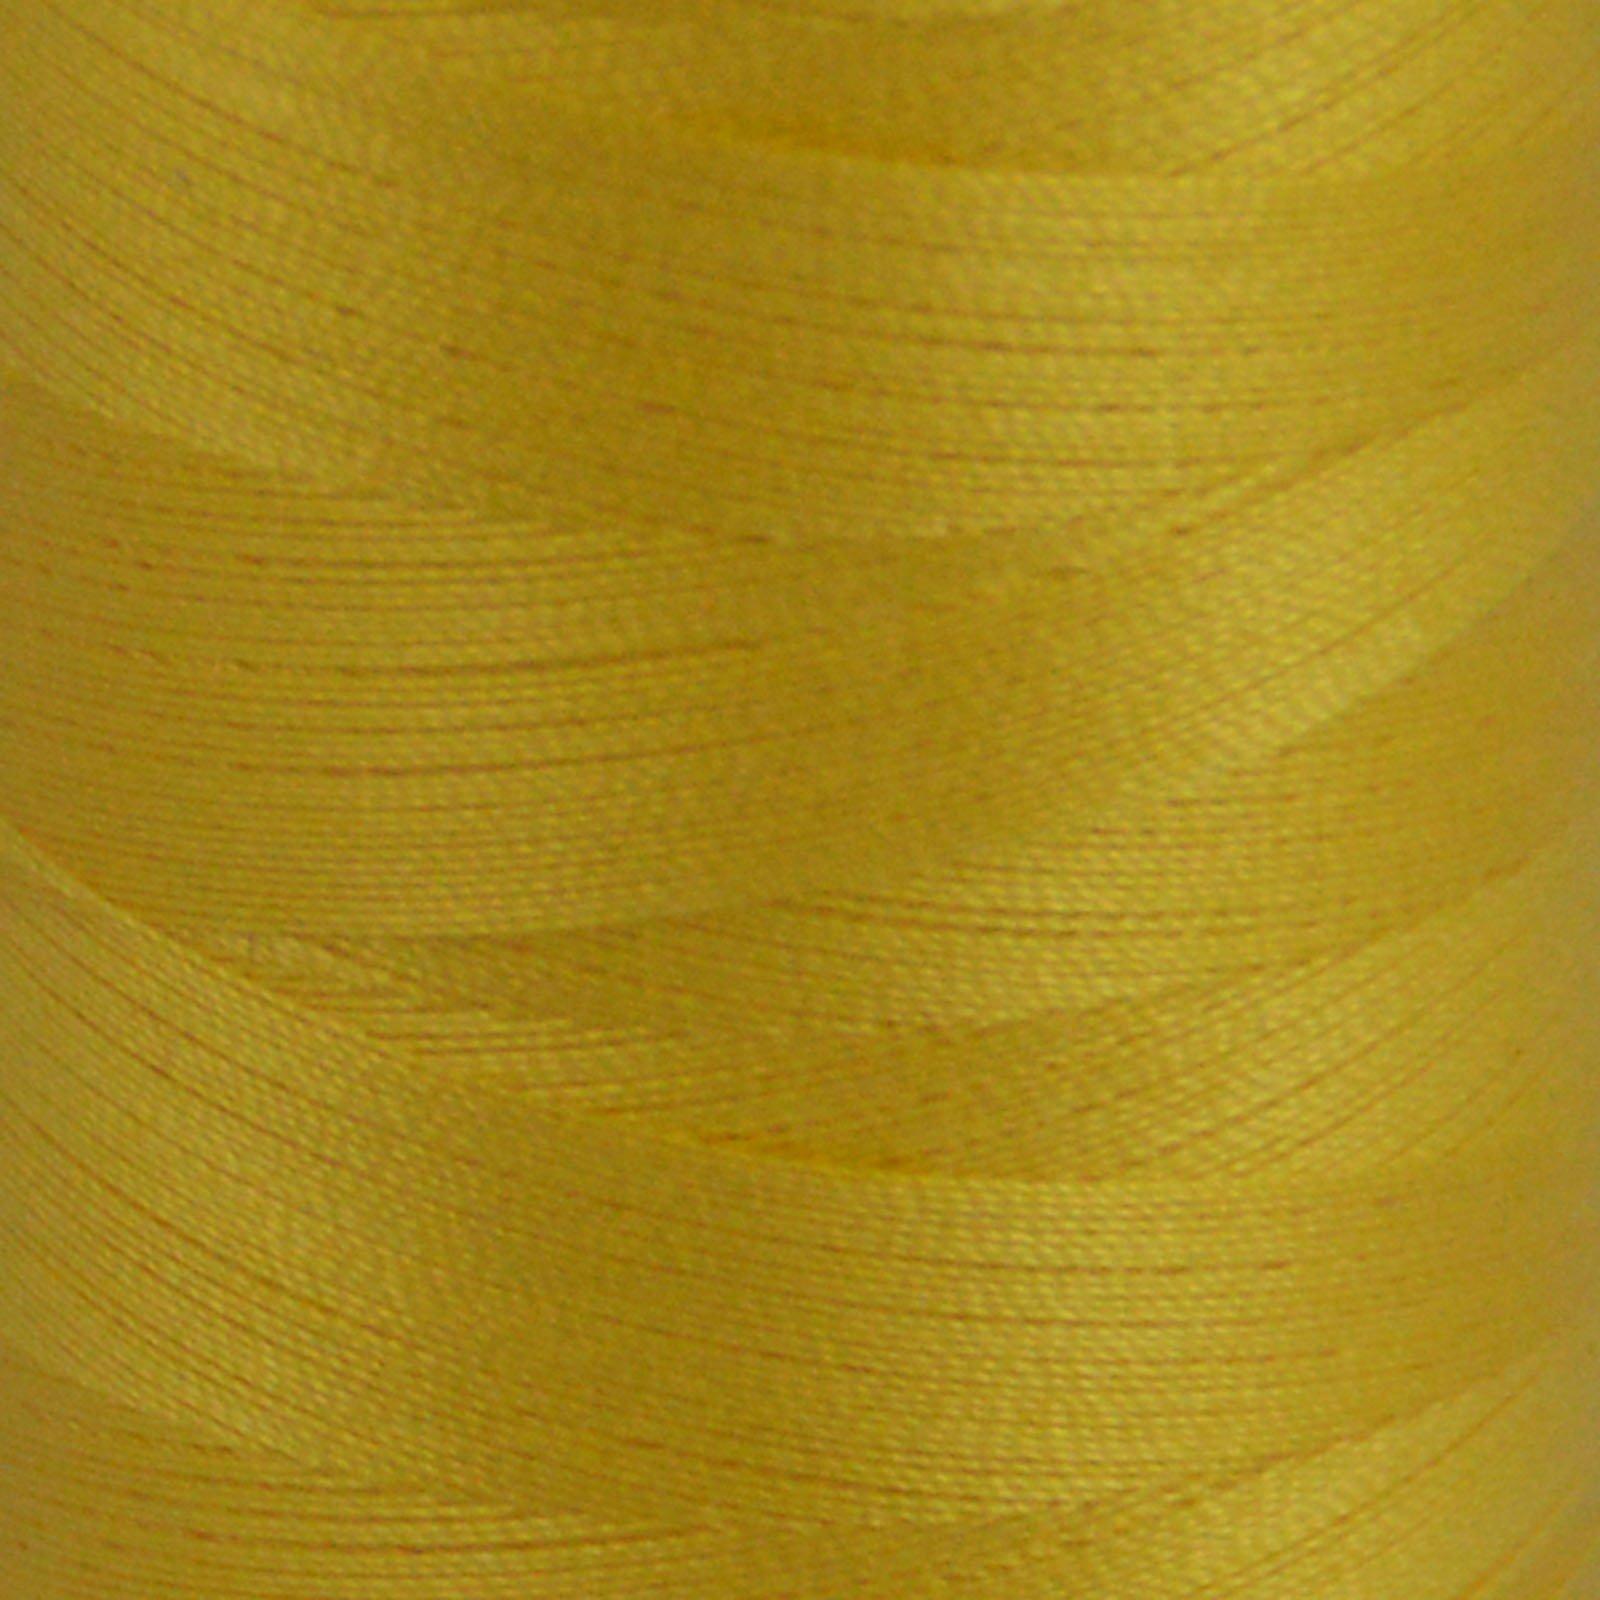 # 1135 Pale Yellow